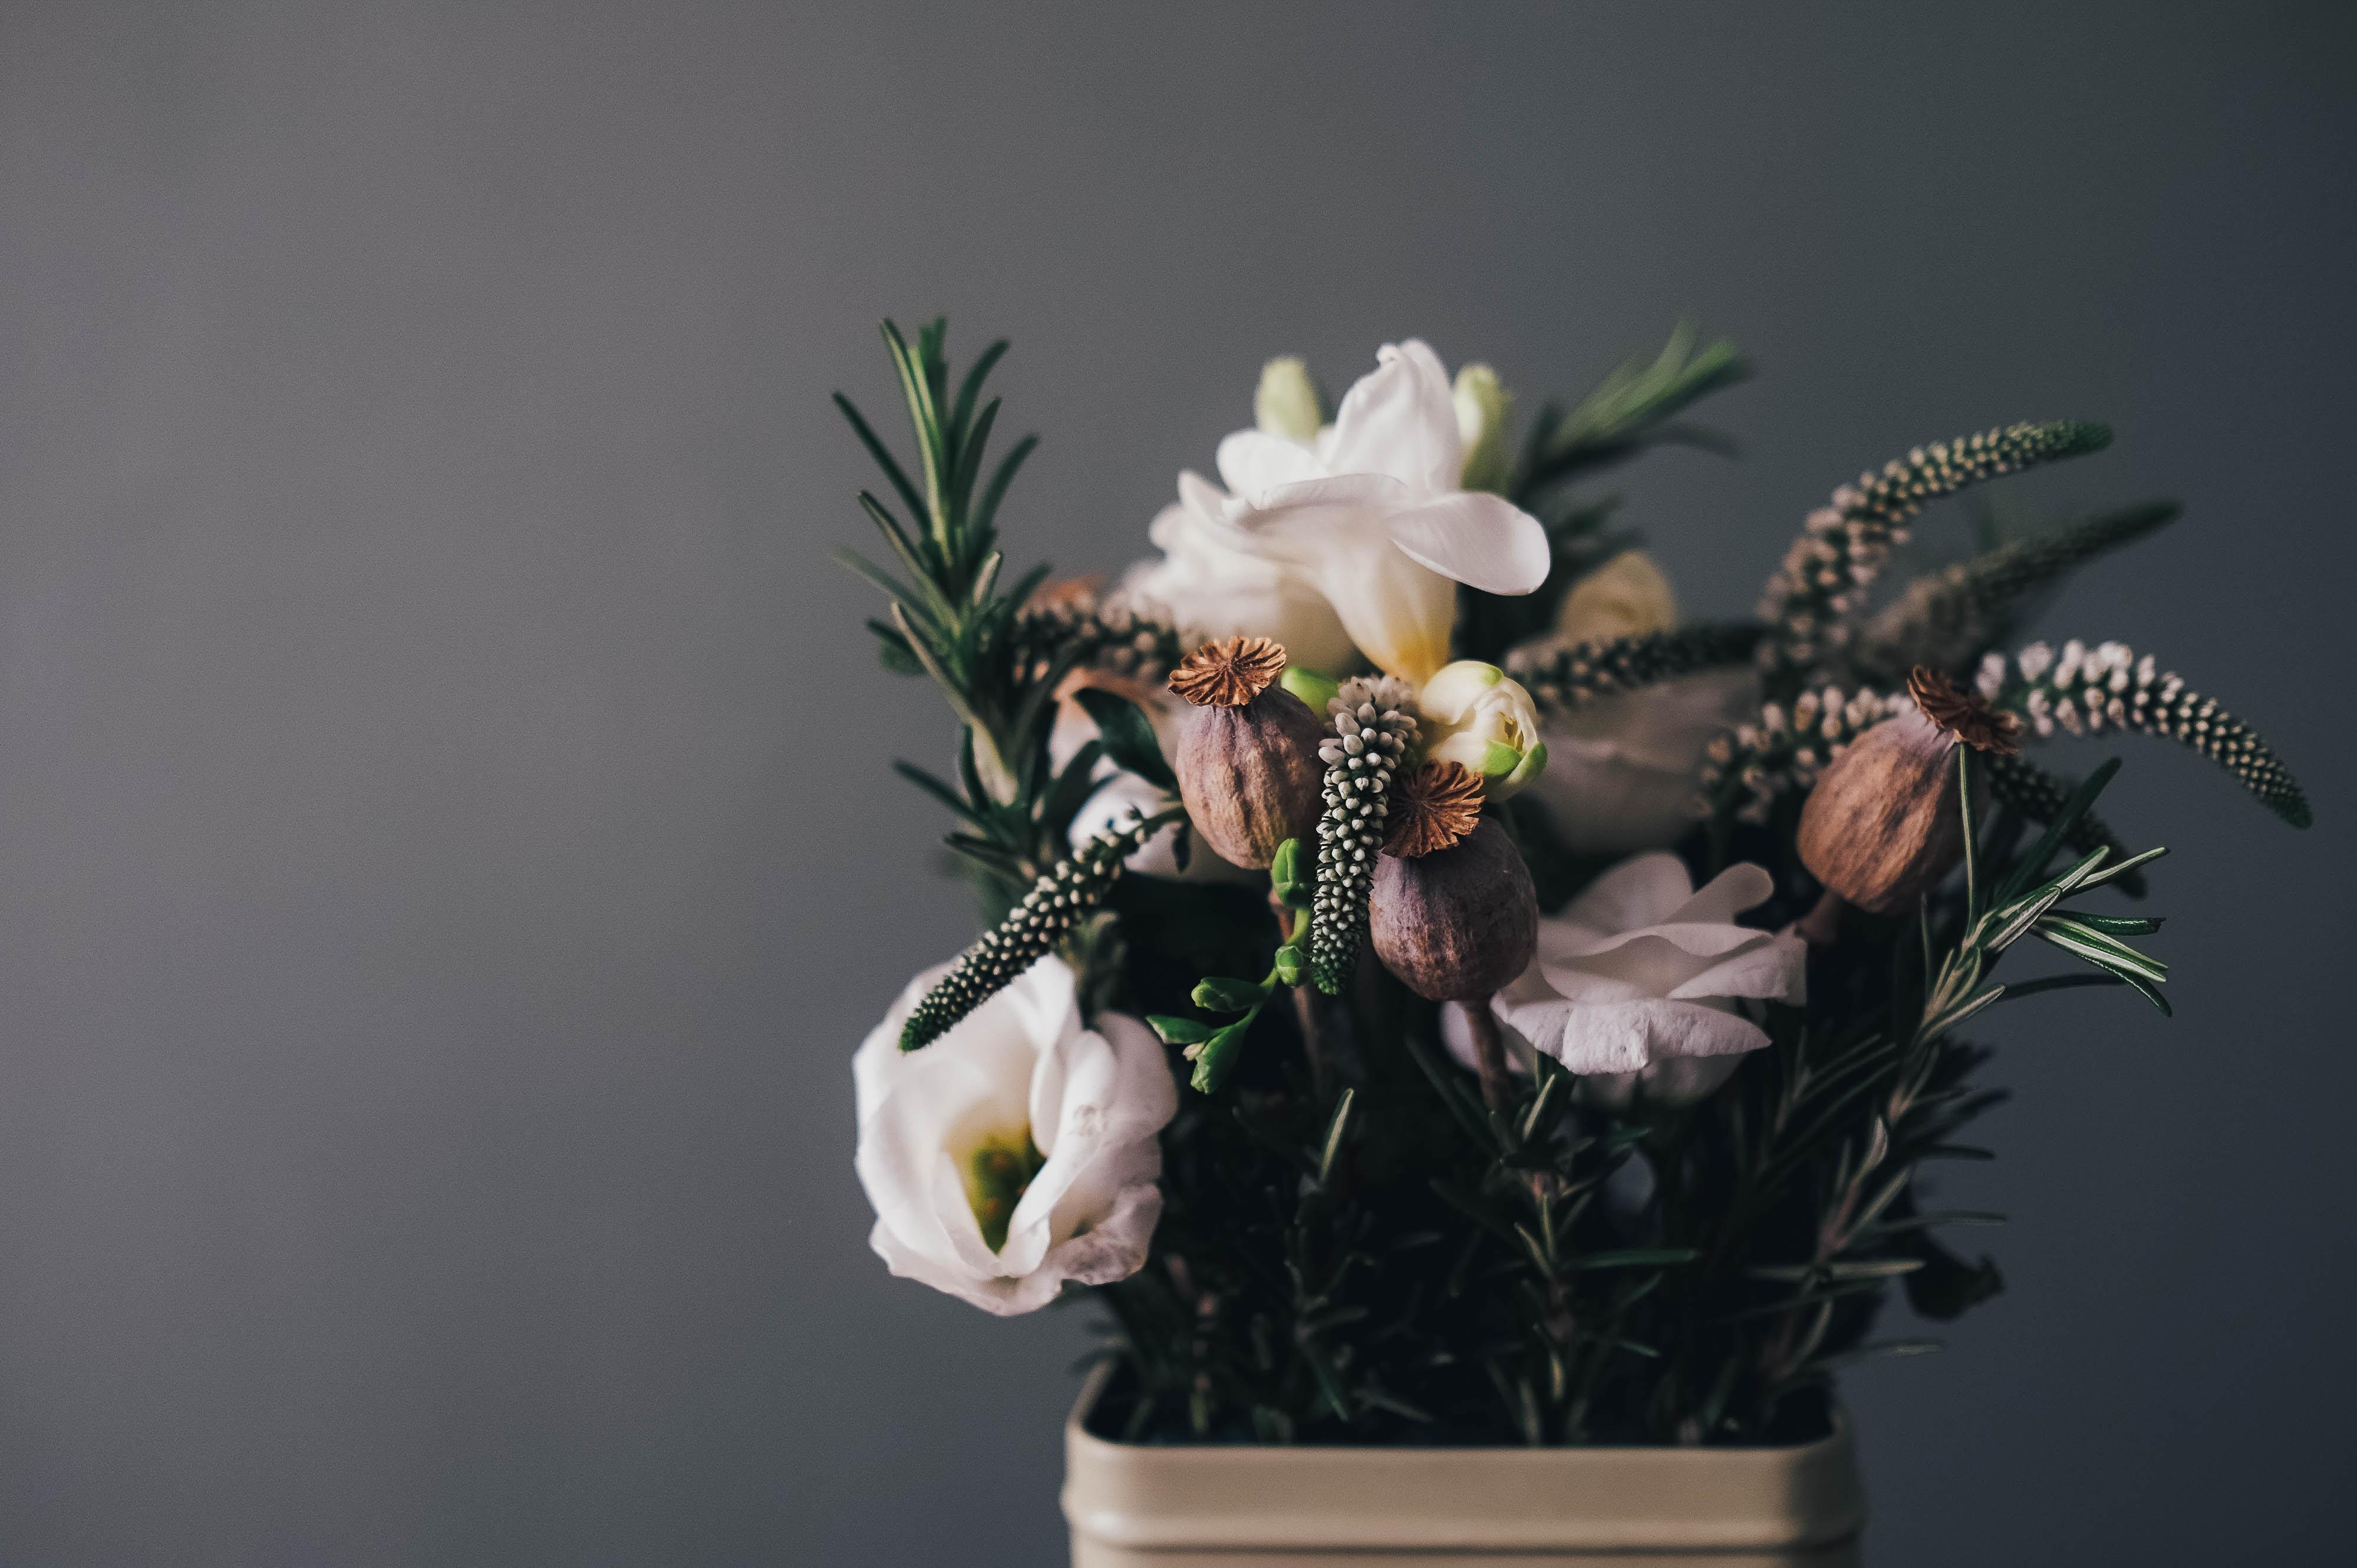 white petal flowers in gray pot in room